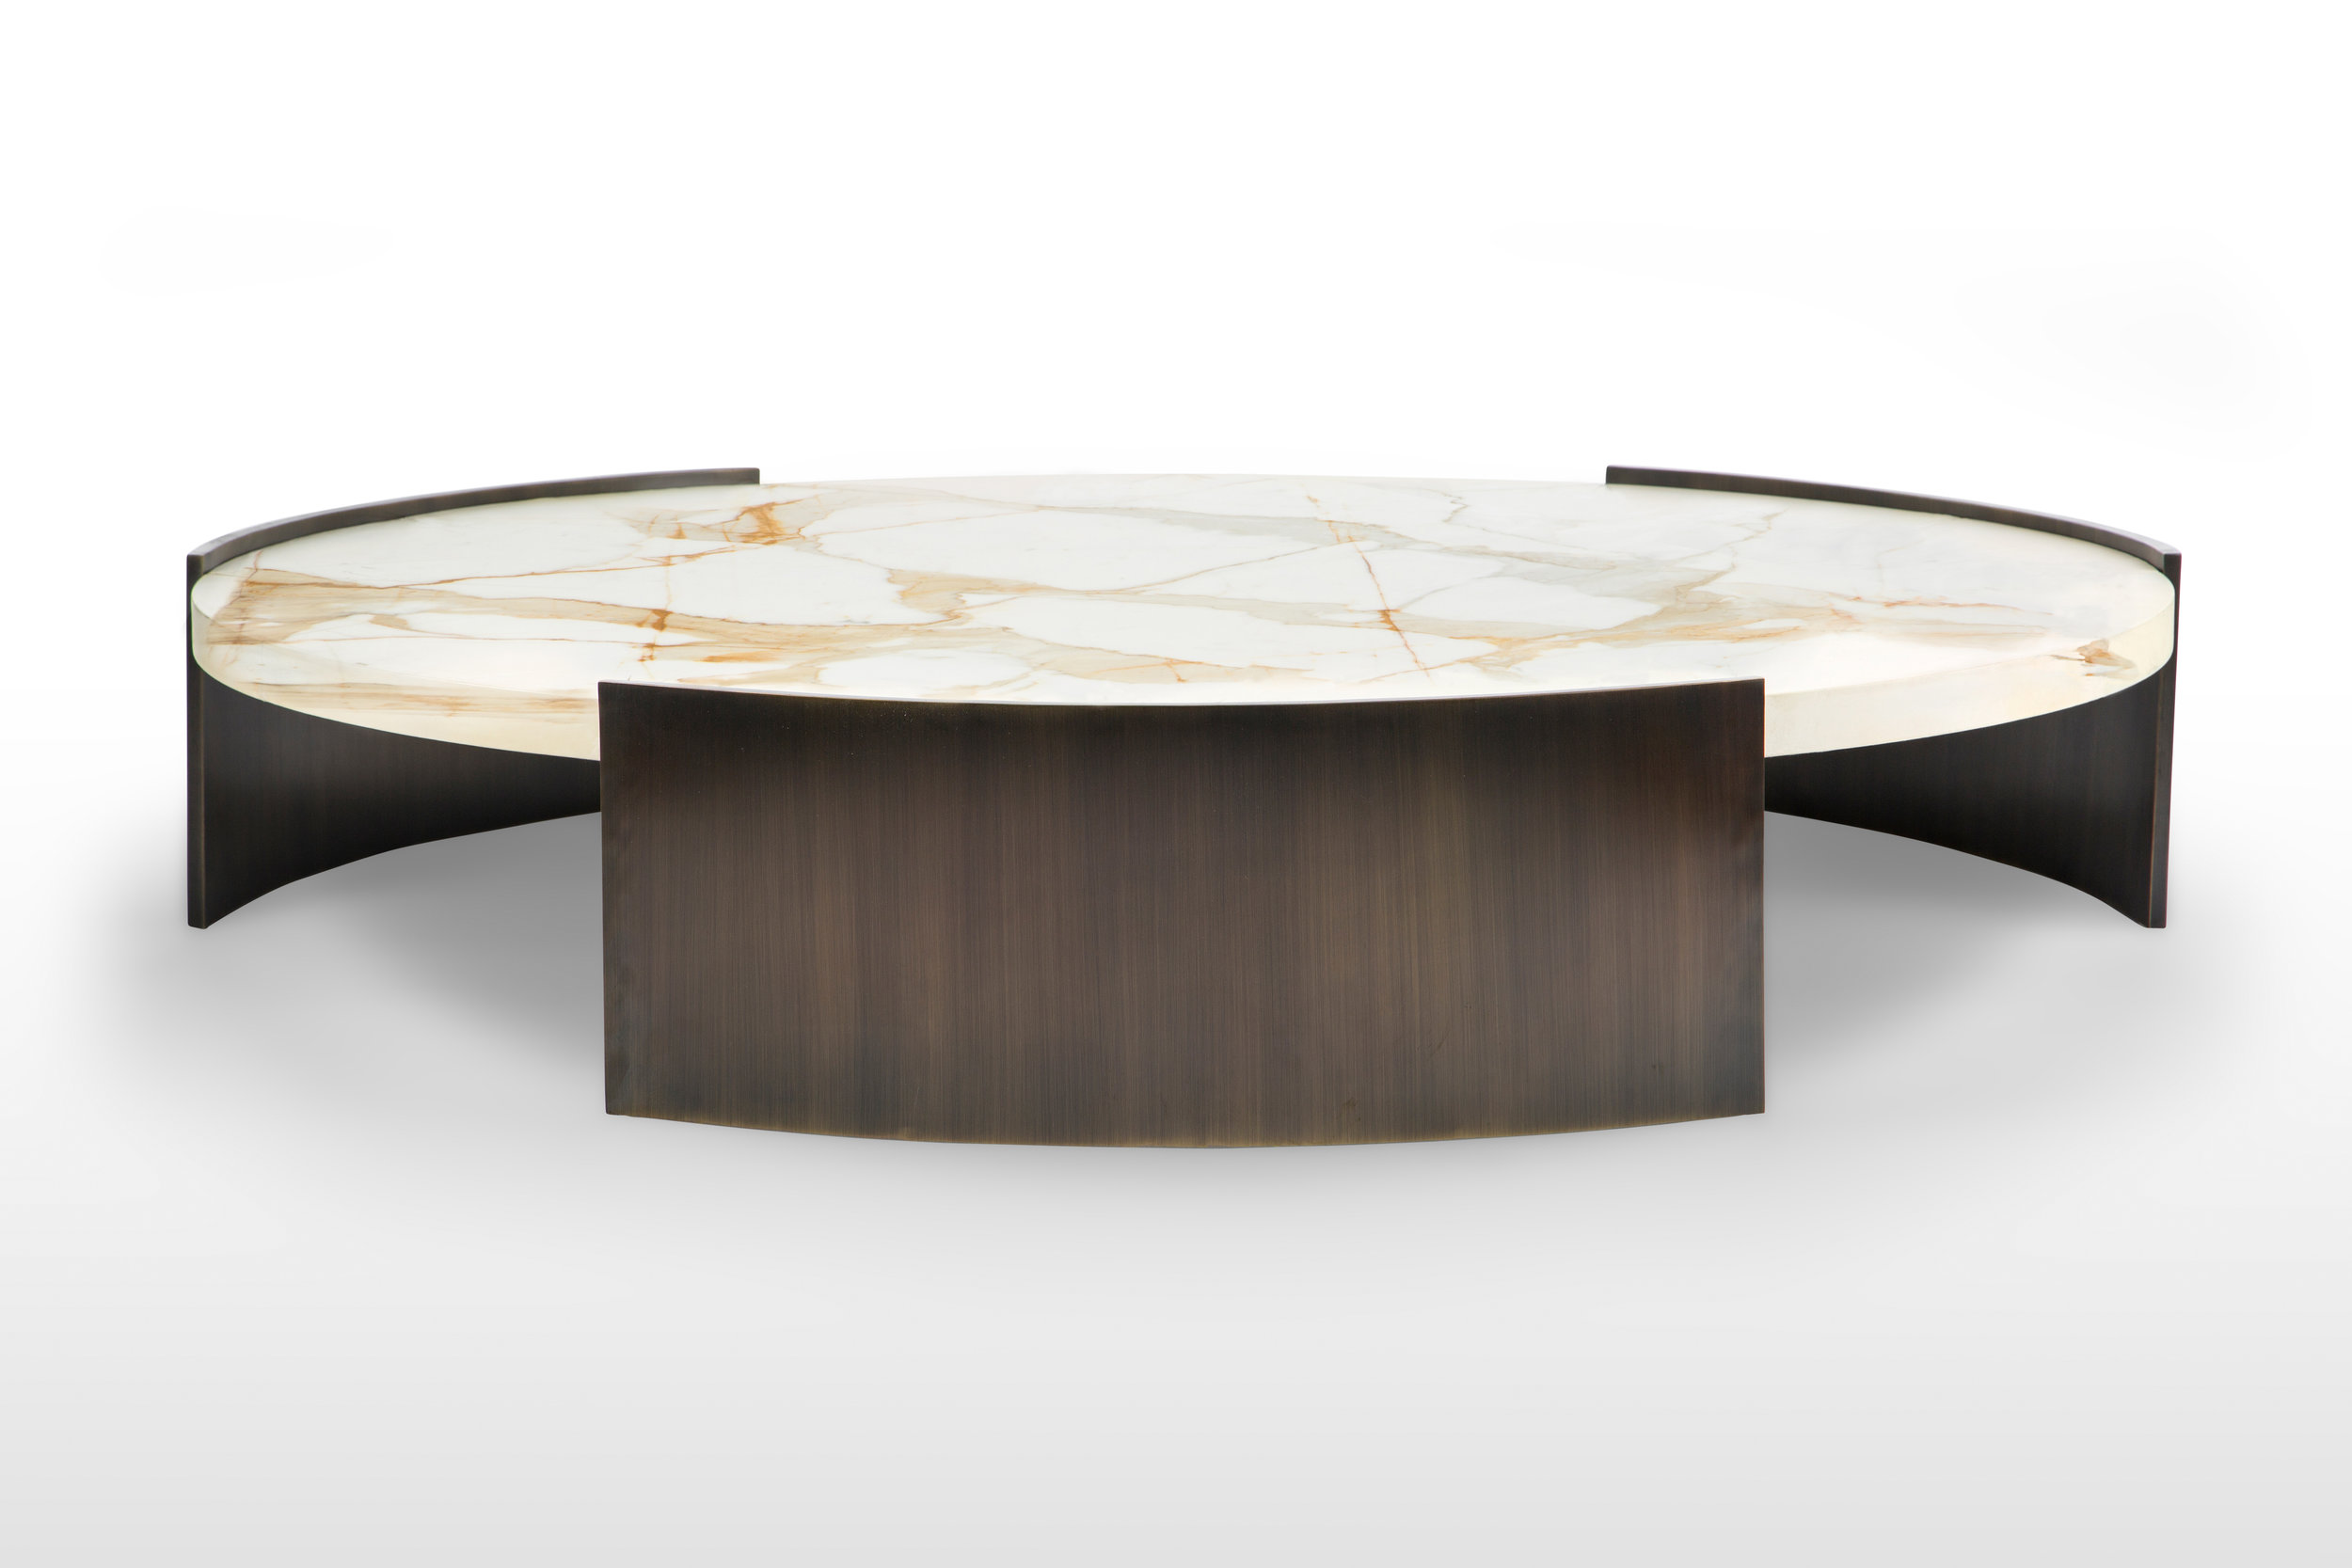 Summitridge Round Coffee Table Marmol Radziner Furniture